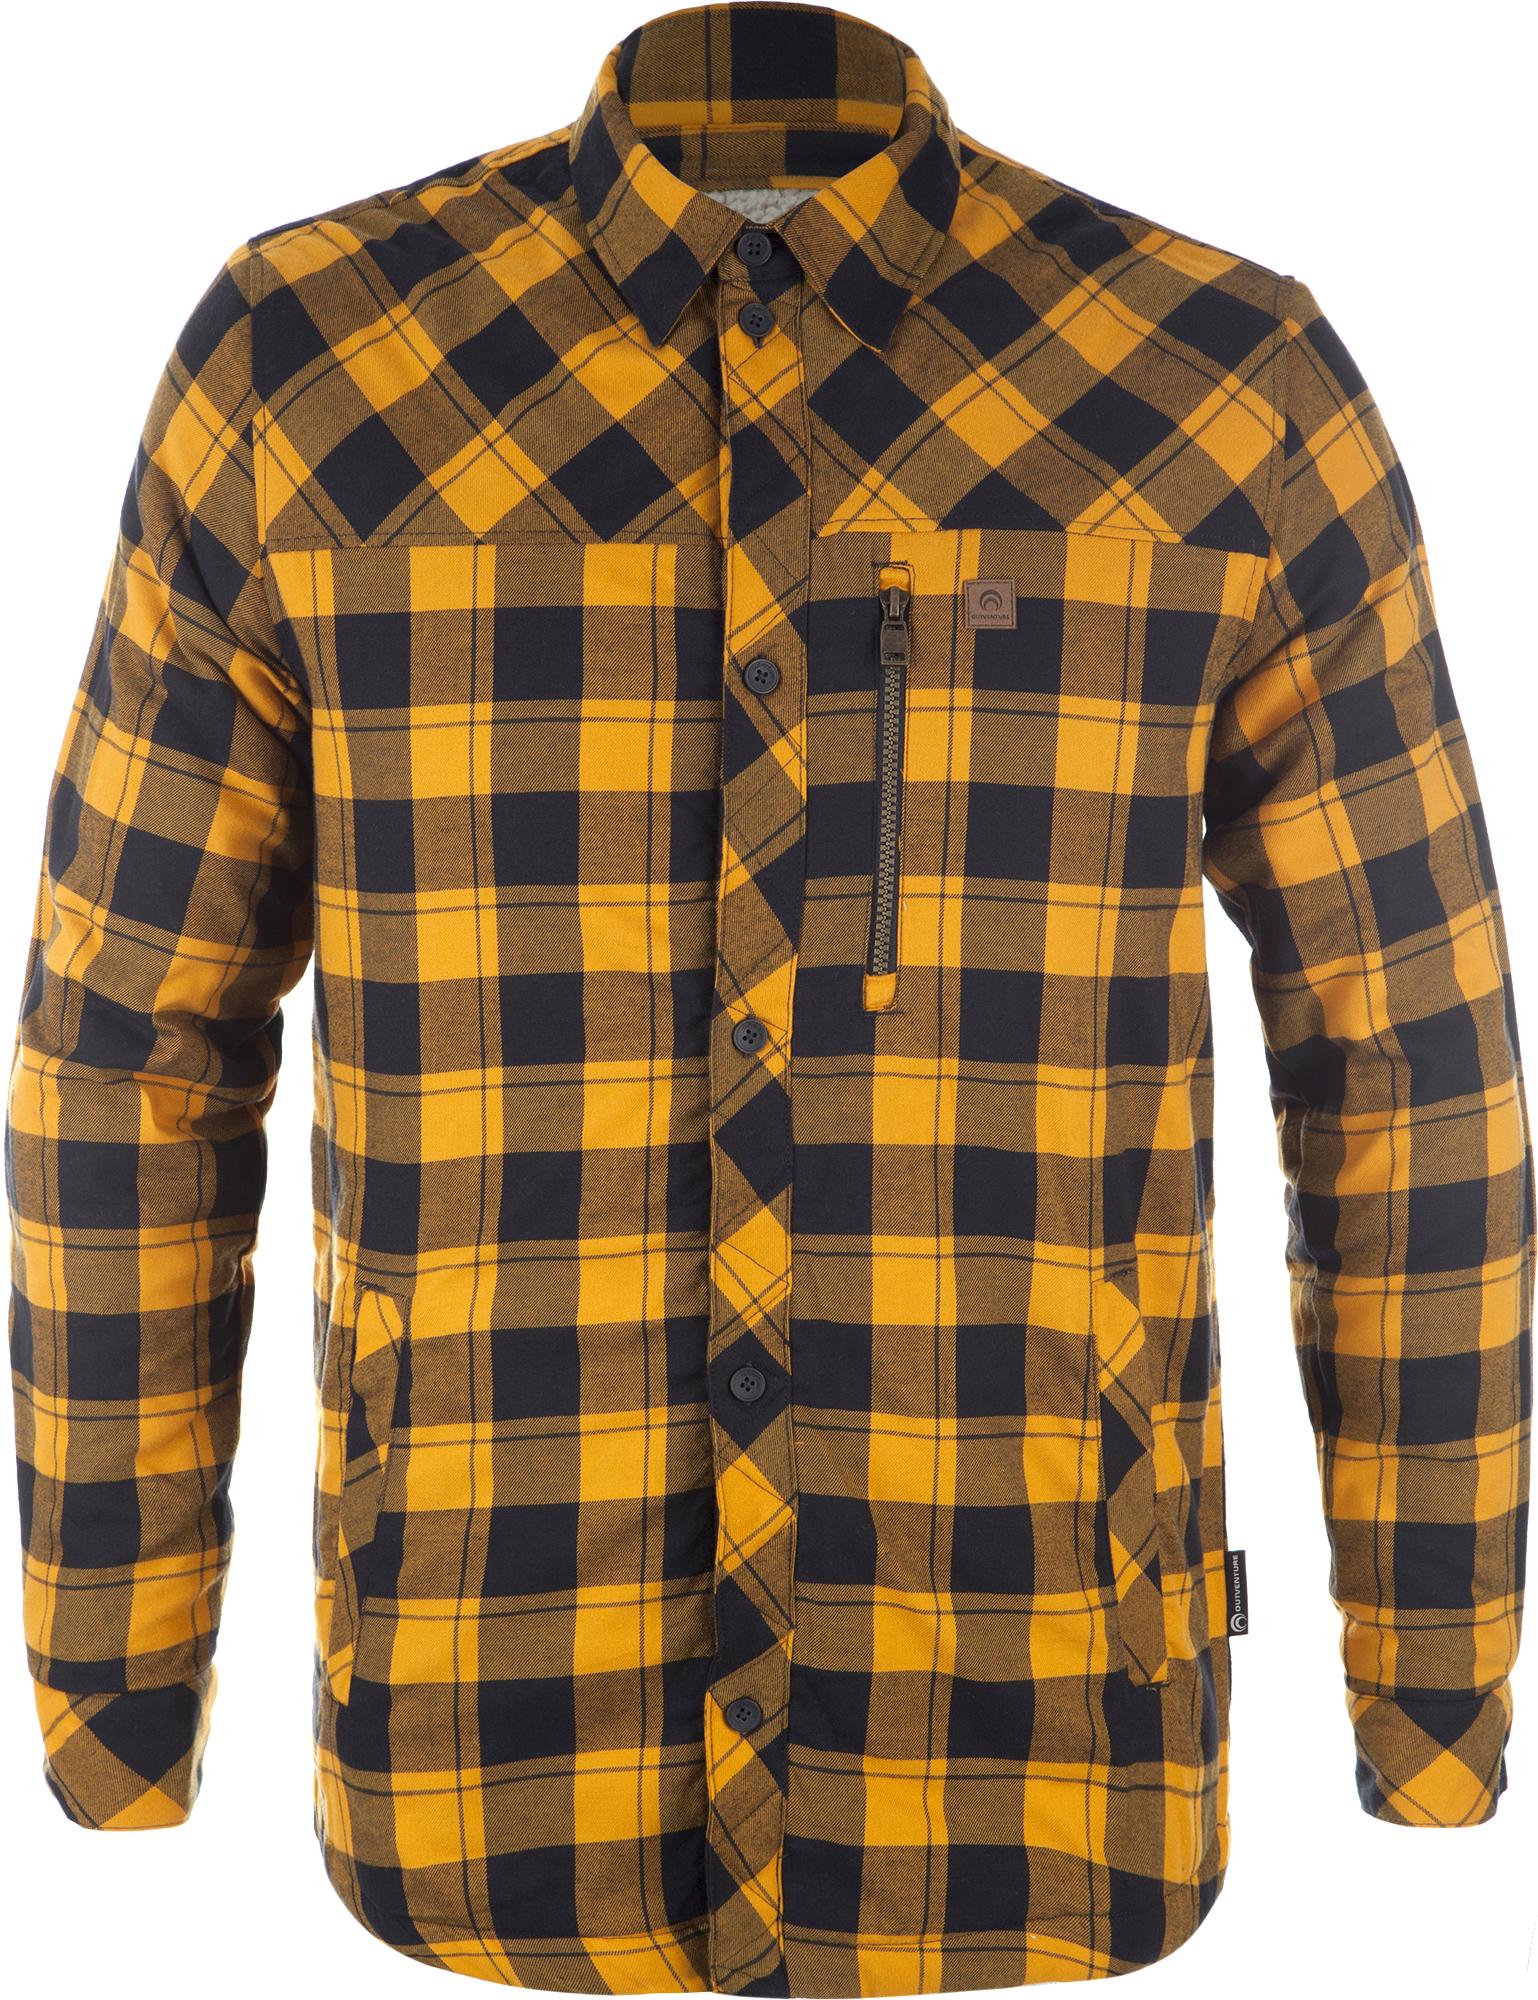 Outventure Рубашка с длинным рукавом мужская Outventure outventure ветровка мужская outventure